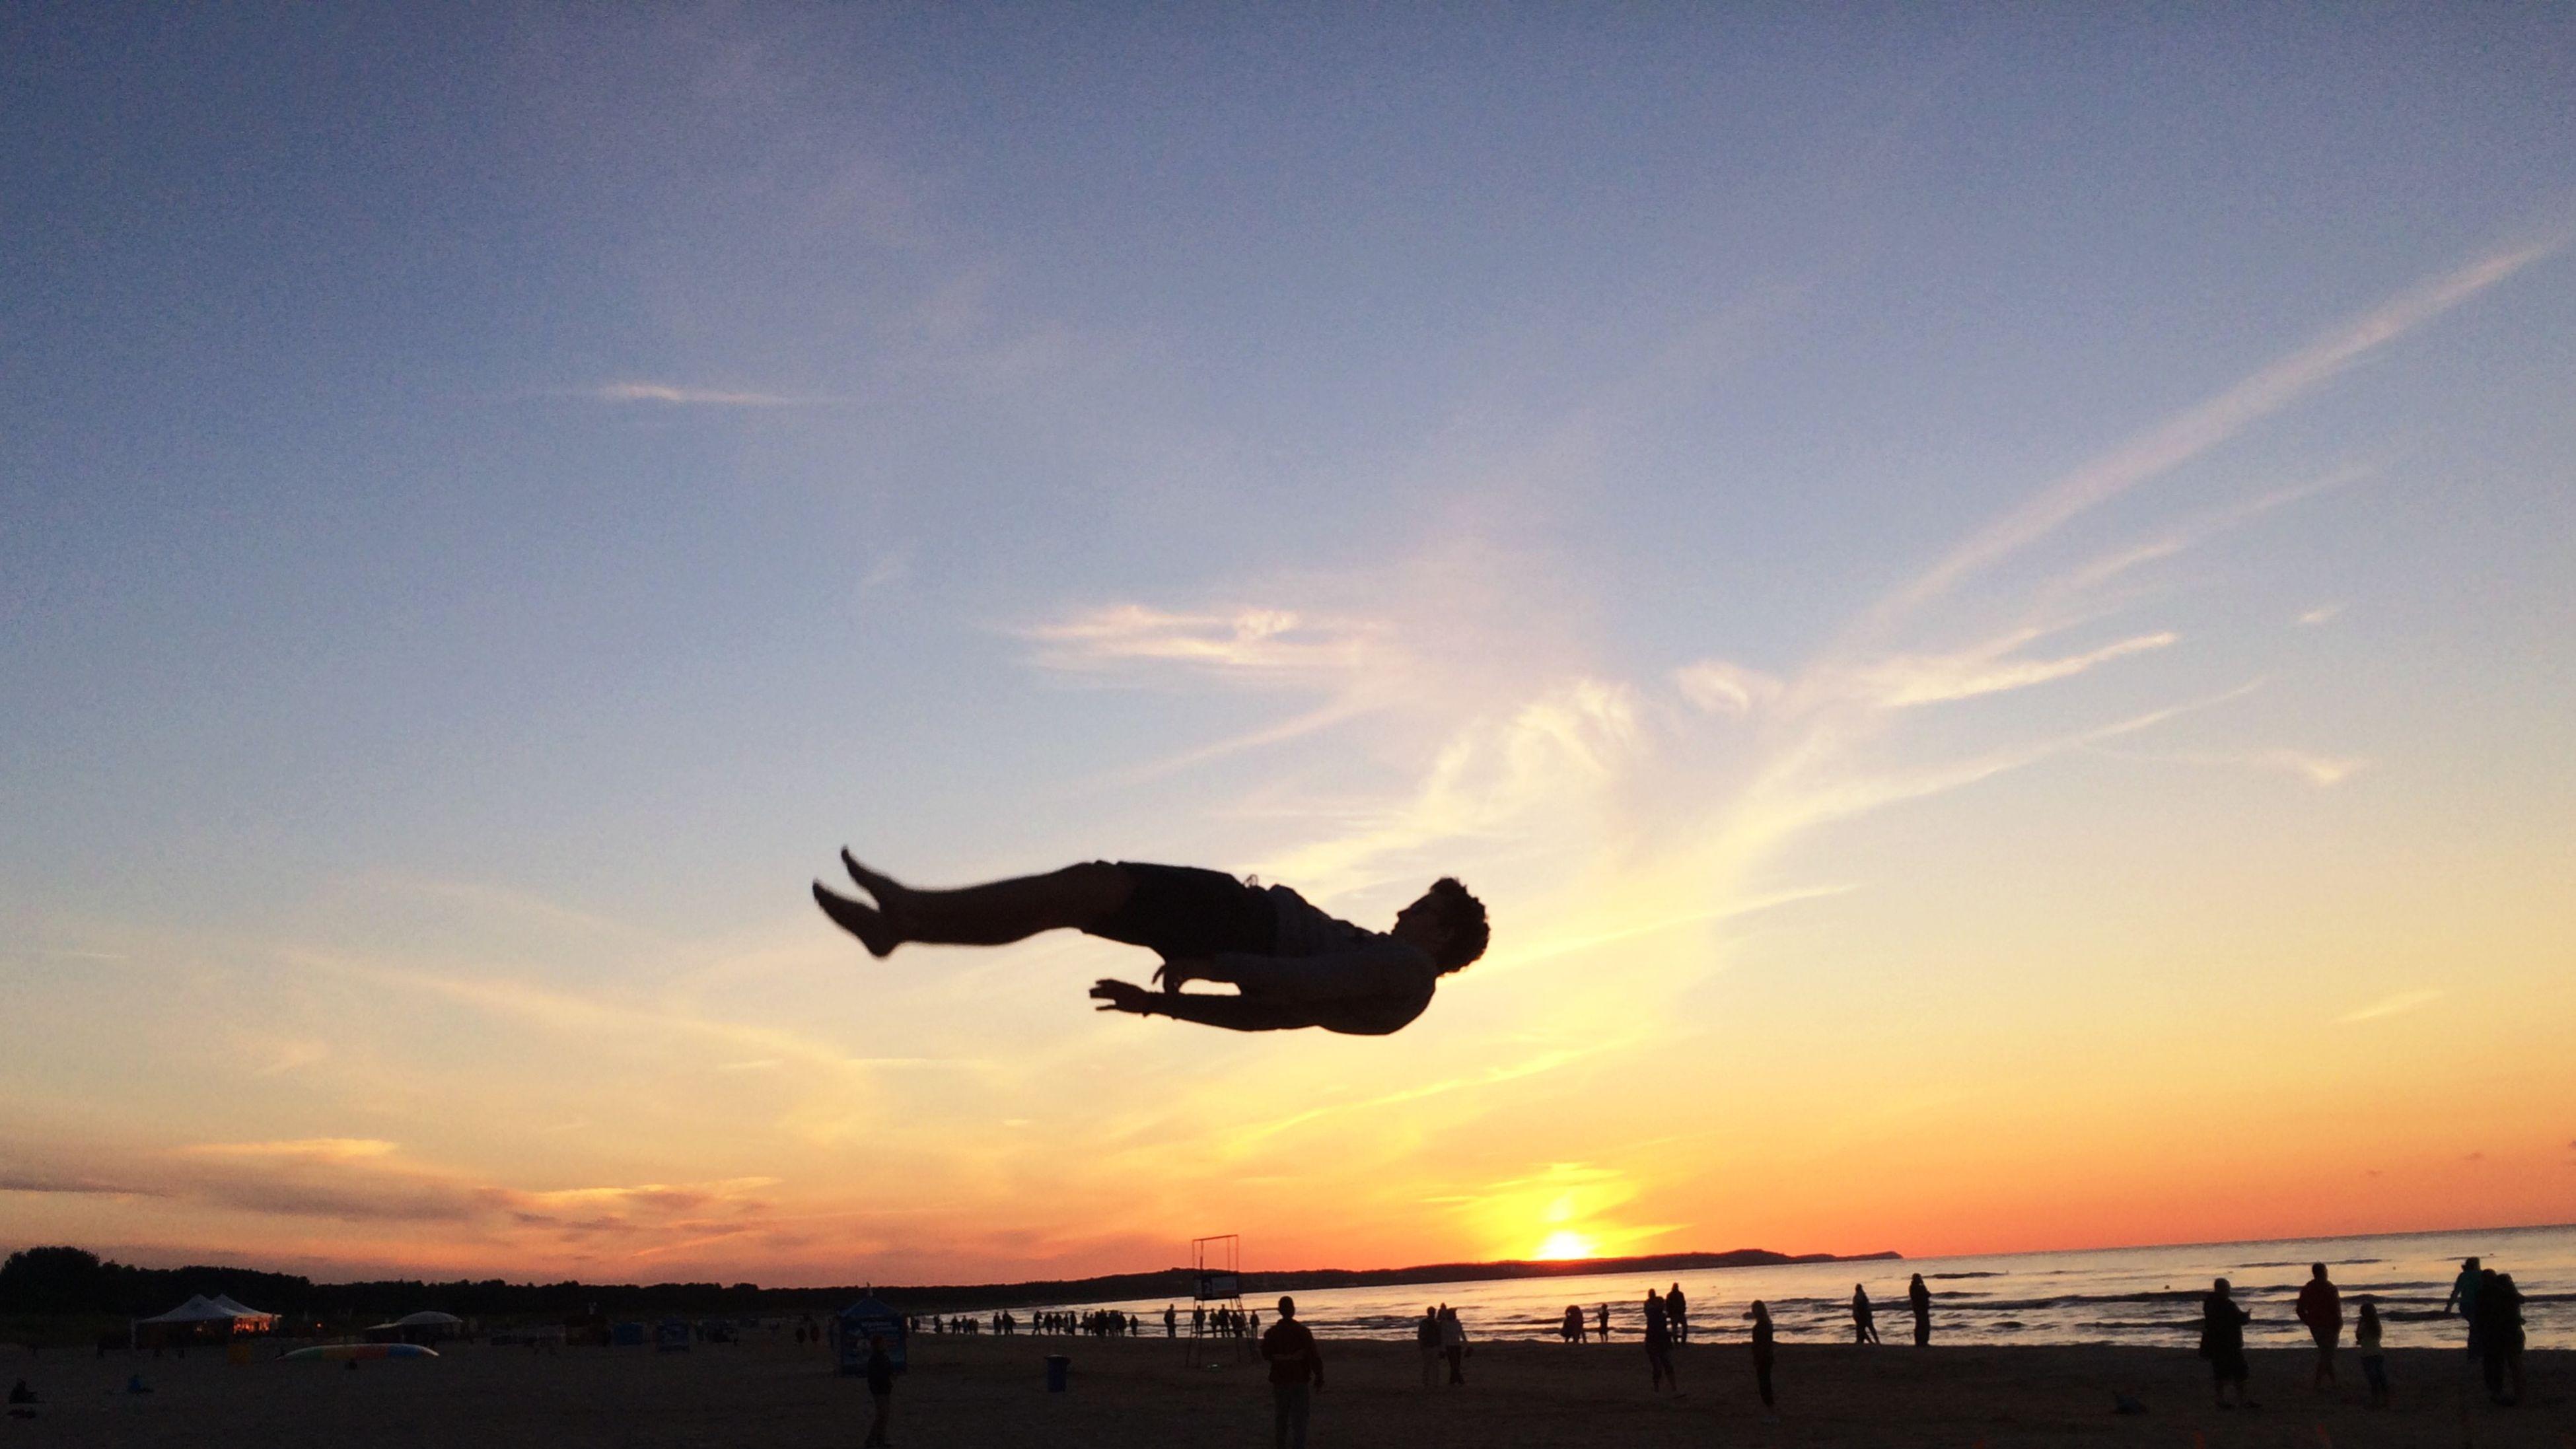 silhouette, sunset, sky, leisure activity, sea, beach, lifestyles, horizon over water, sun, men, enjoyment, scenics, beauty in nature, nature, mid-air, sunlight, full length, cloud - sky